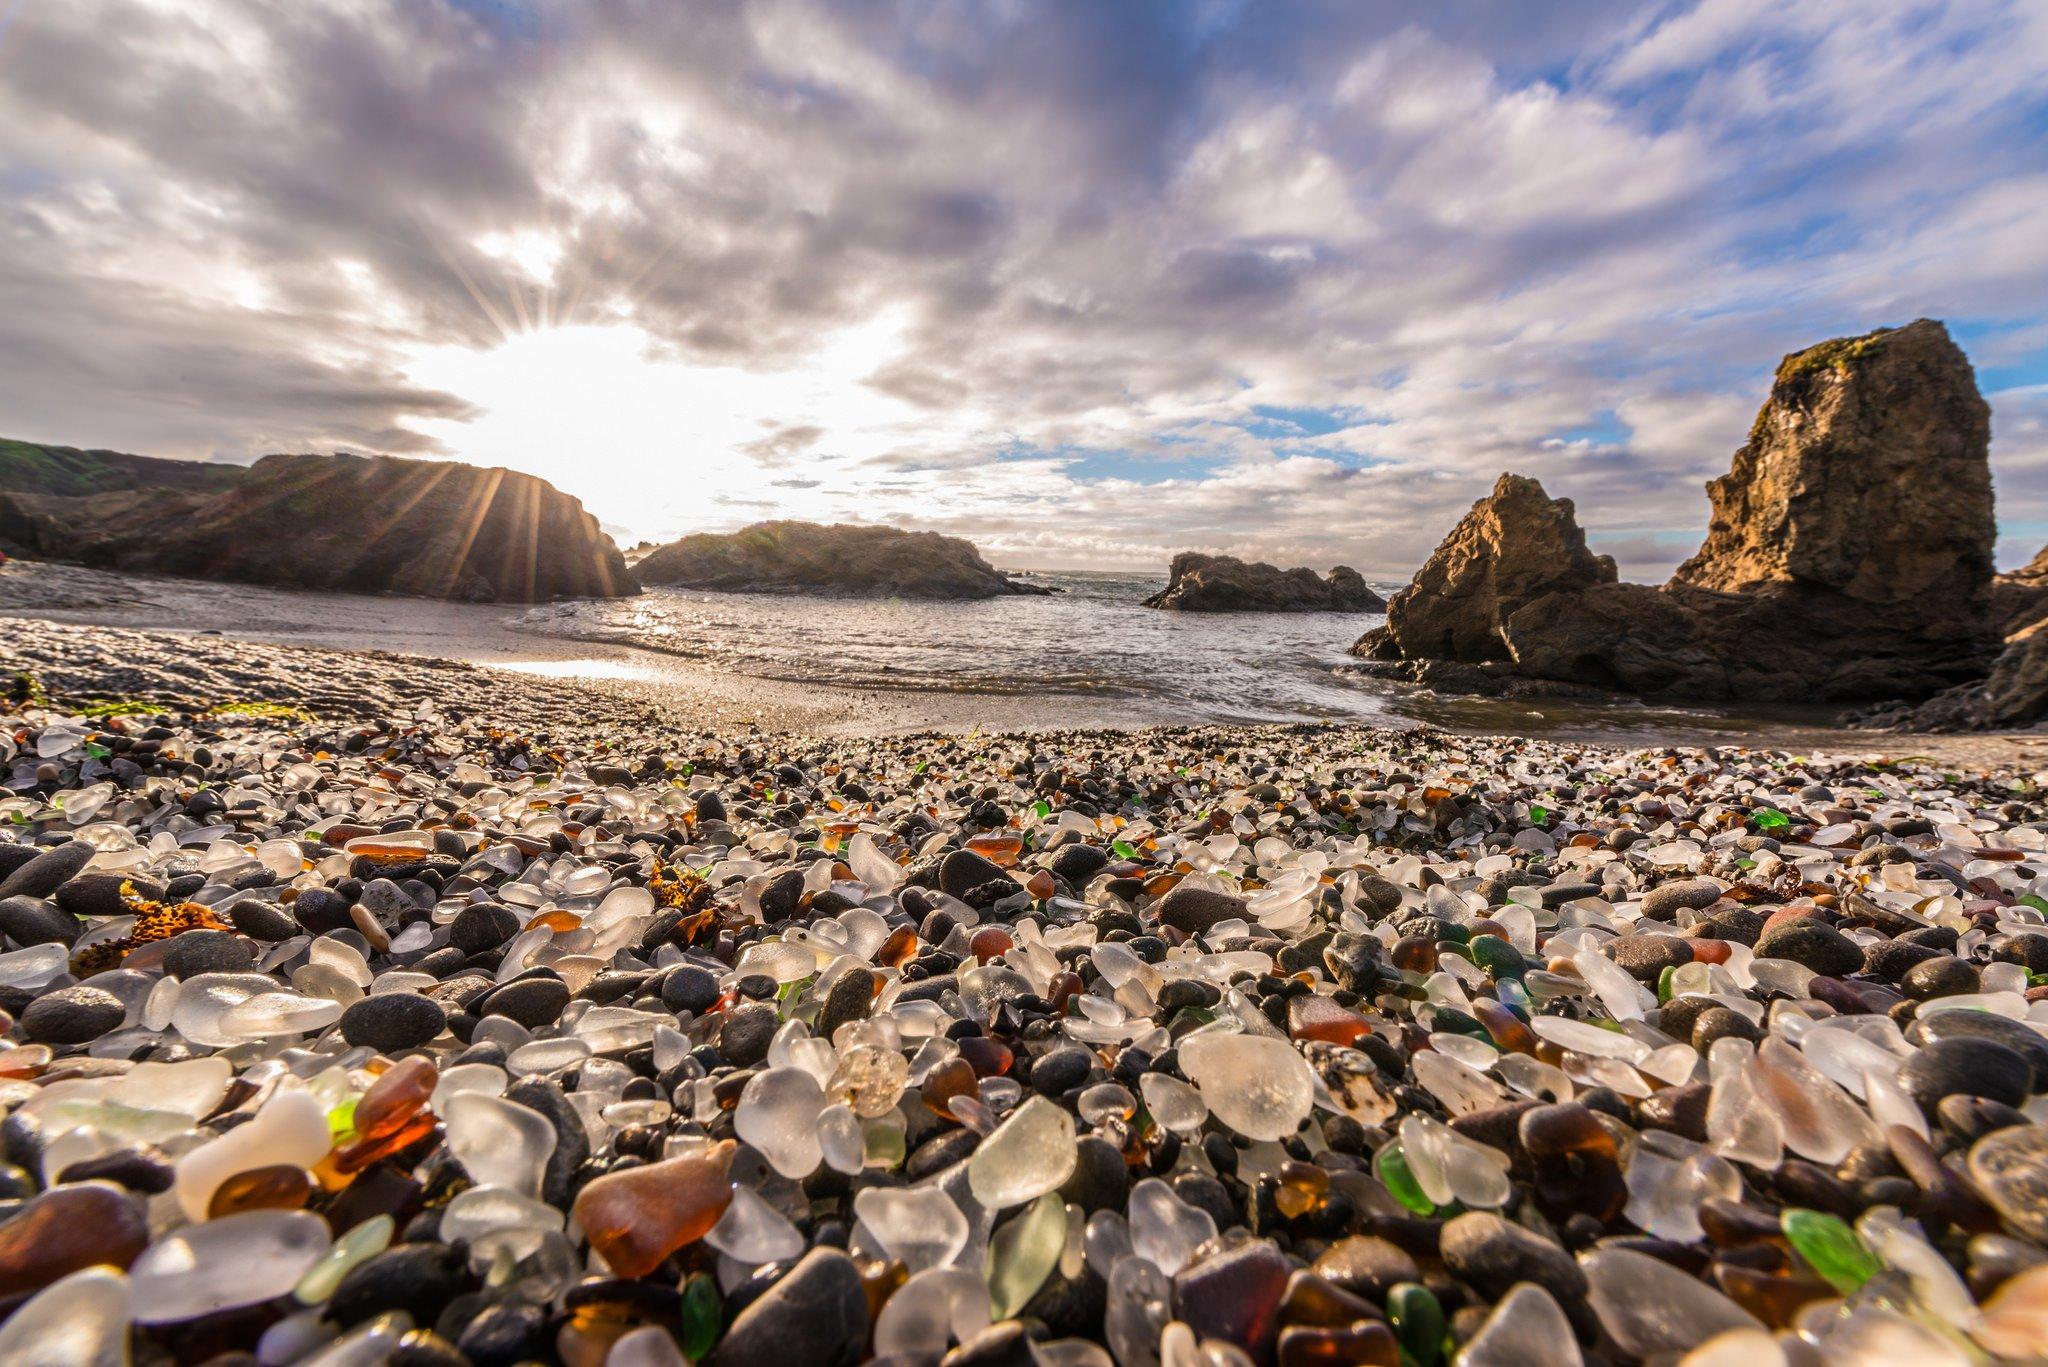 plage de verre, Californie5